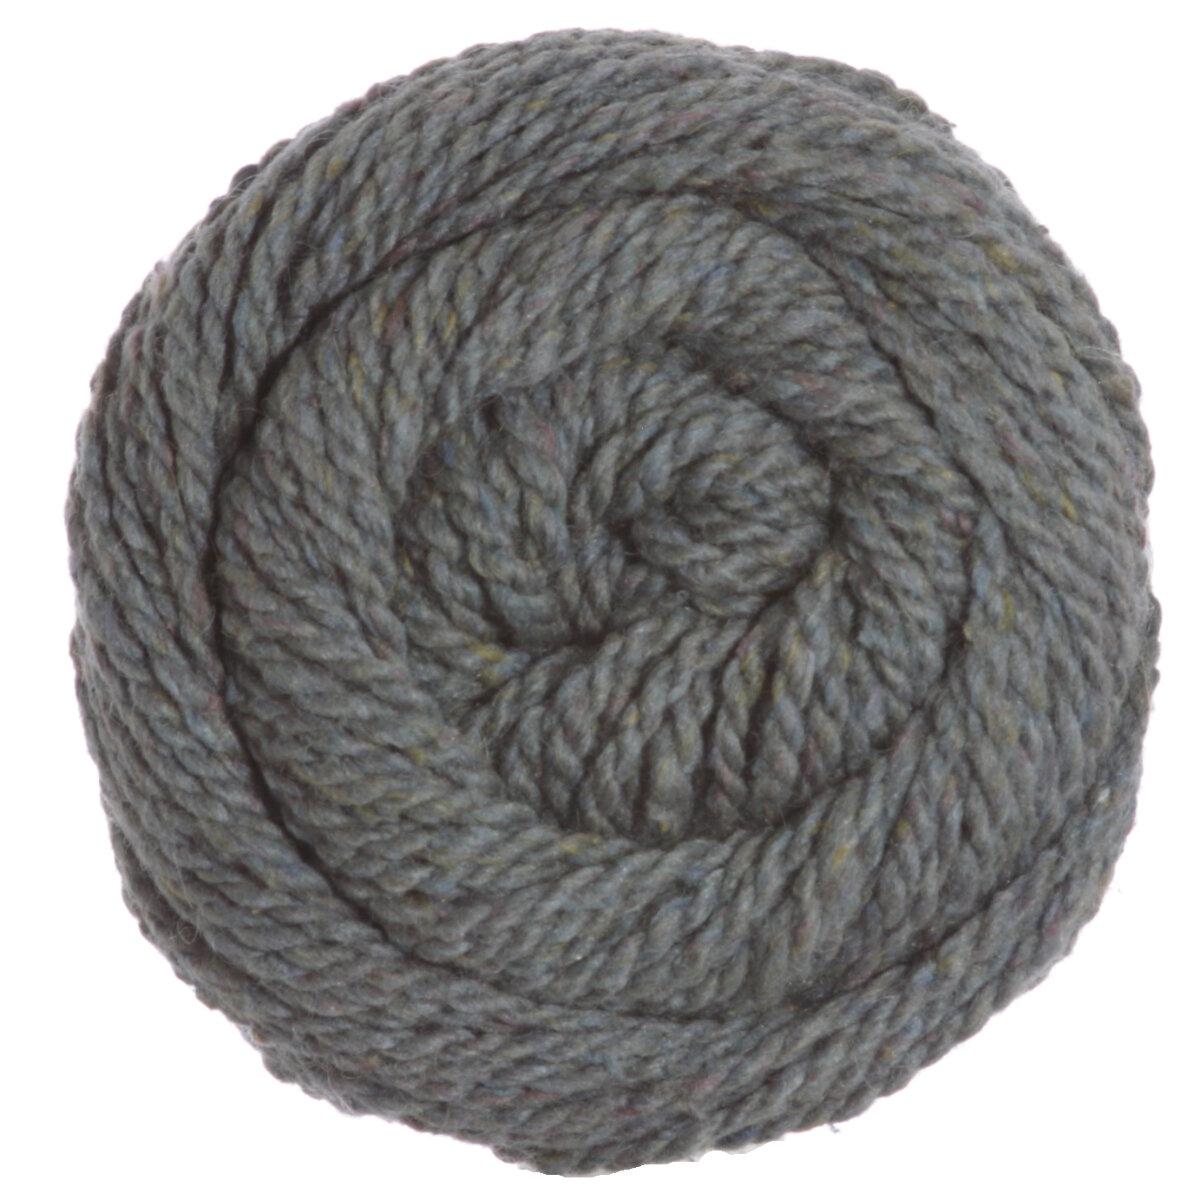 Free Knit Hat Patterns For Women : Cascade Tivoli Yarn at Jimmy Beans Wool